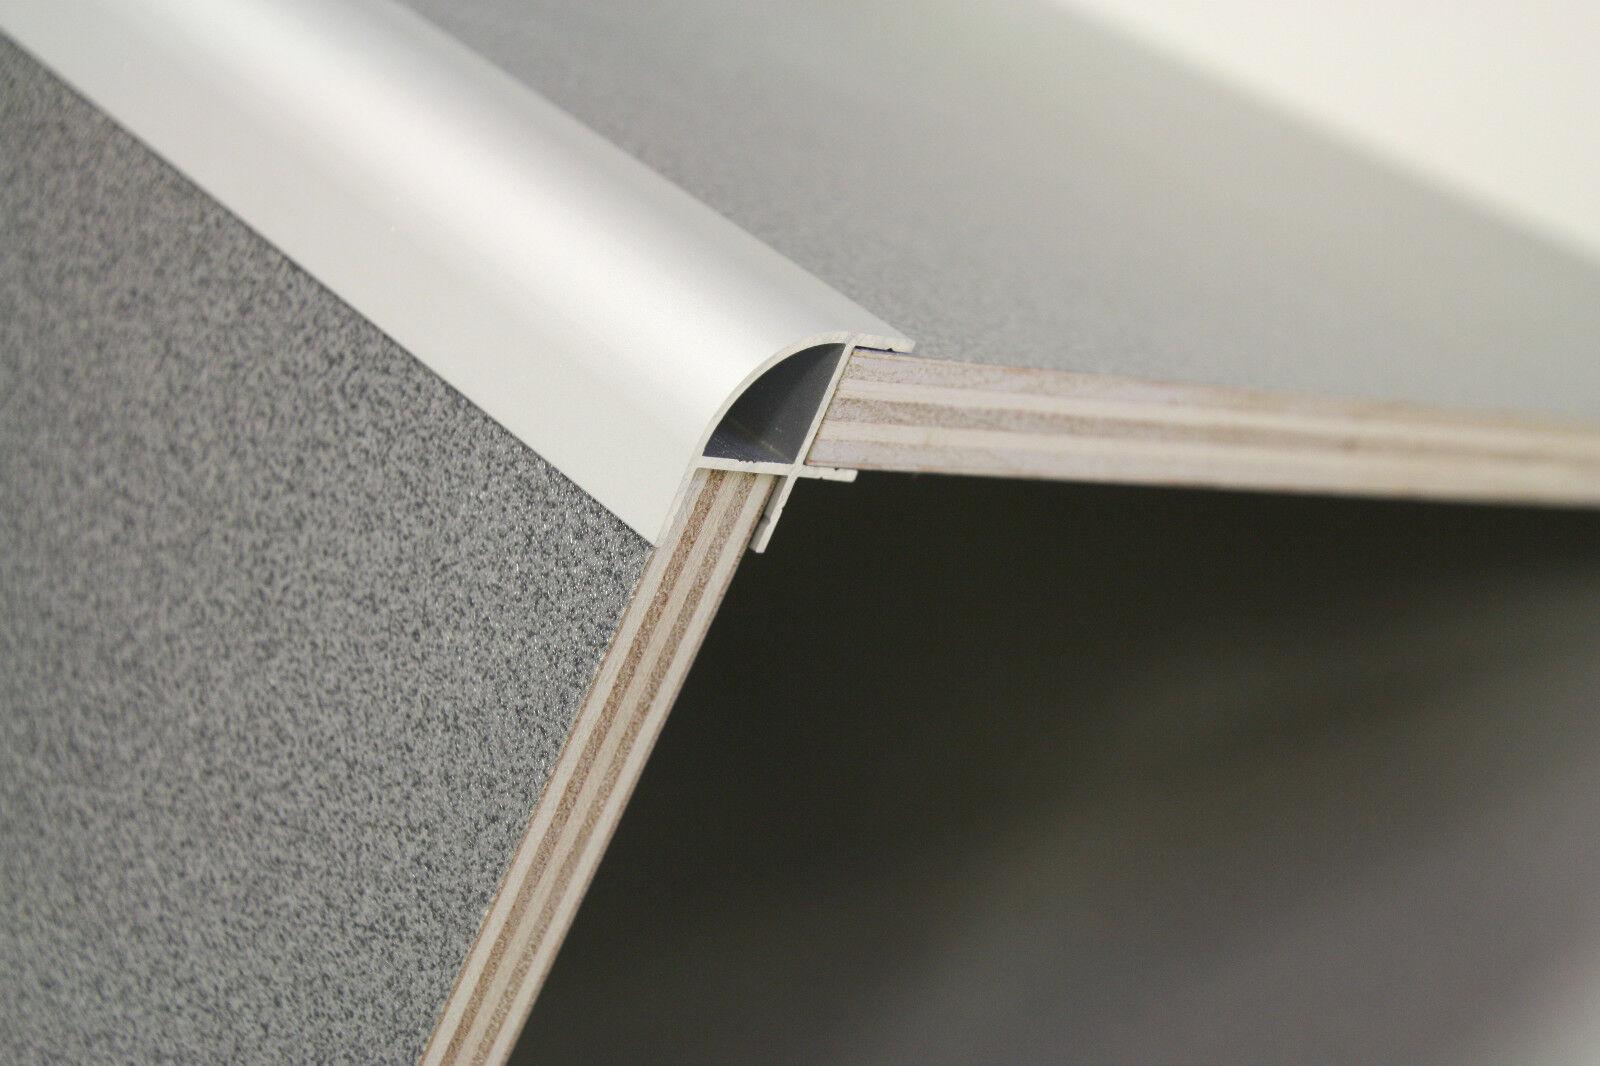 500mm aluminium corner profile small radius 20mm for 15mm campervan plywood ebay. Black Bedroom Furniture Sets. Home Design Ideas